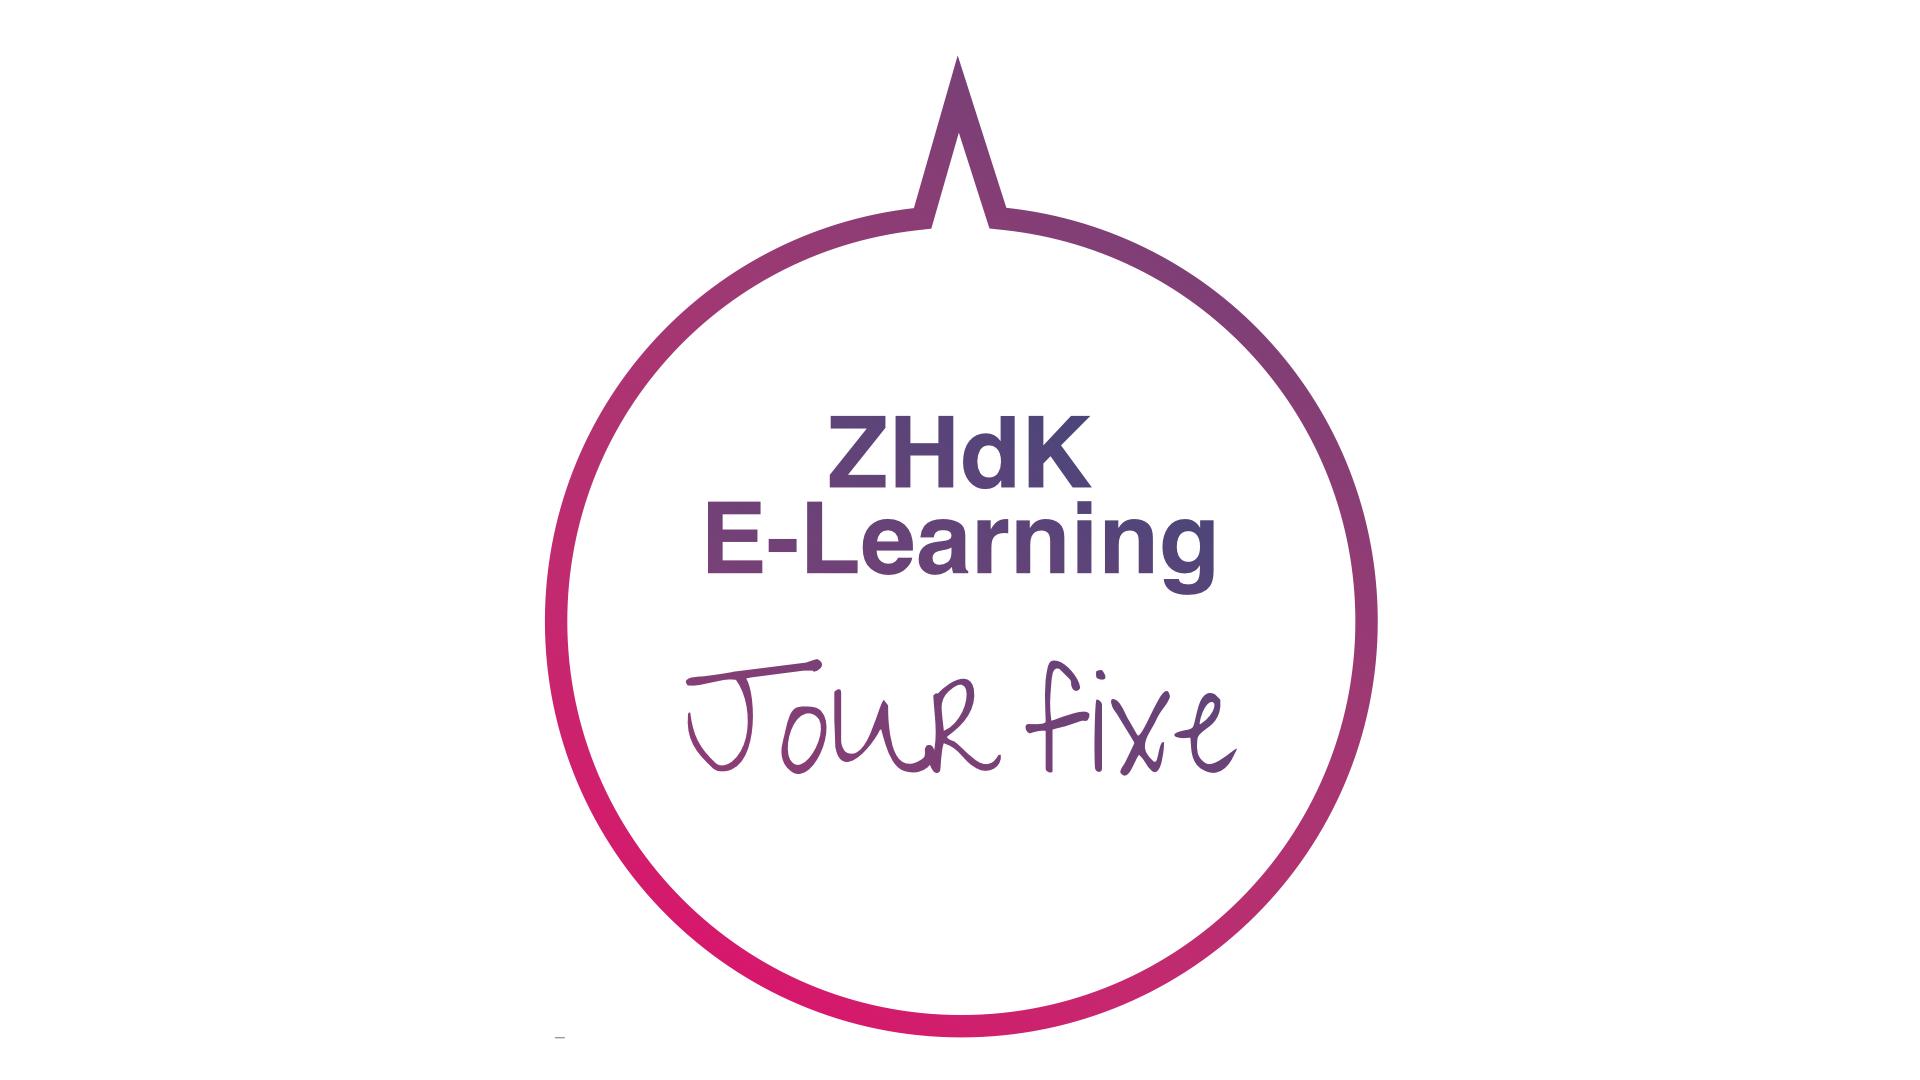 ZHdK E-Learning Jour fixe